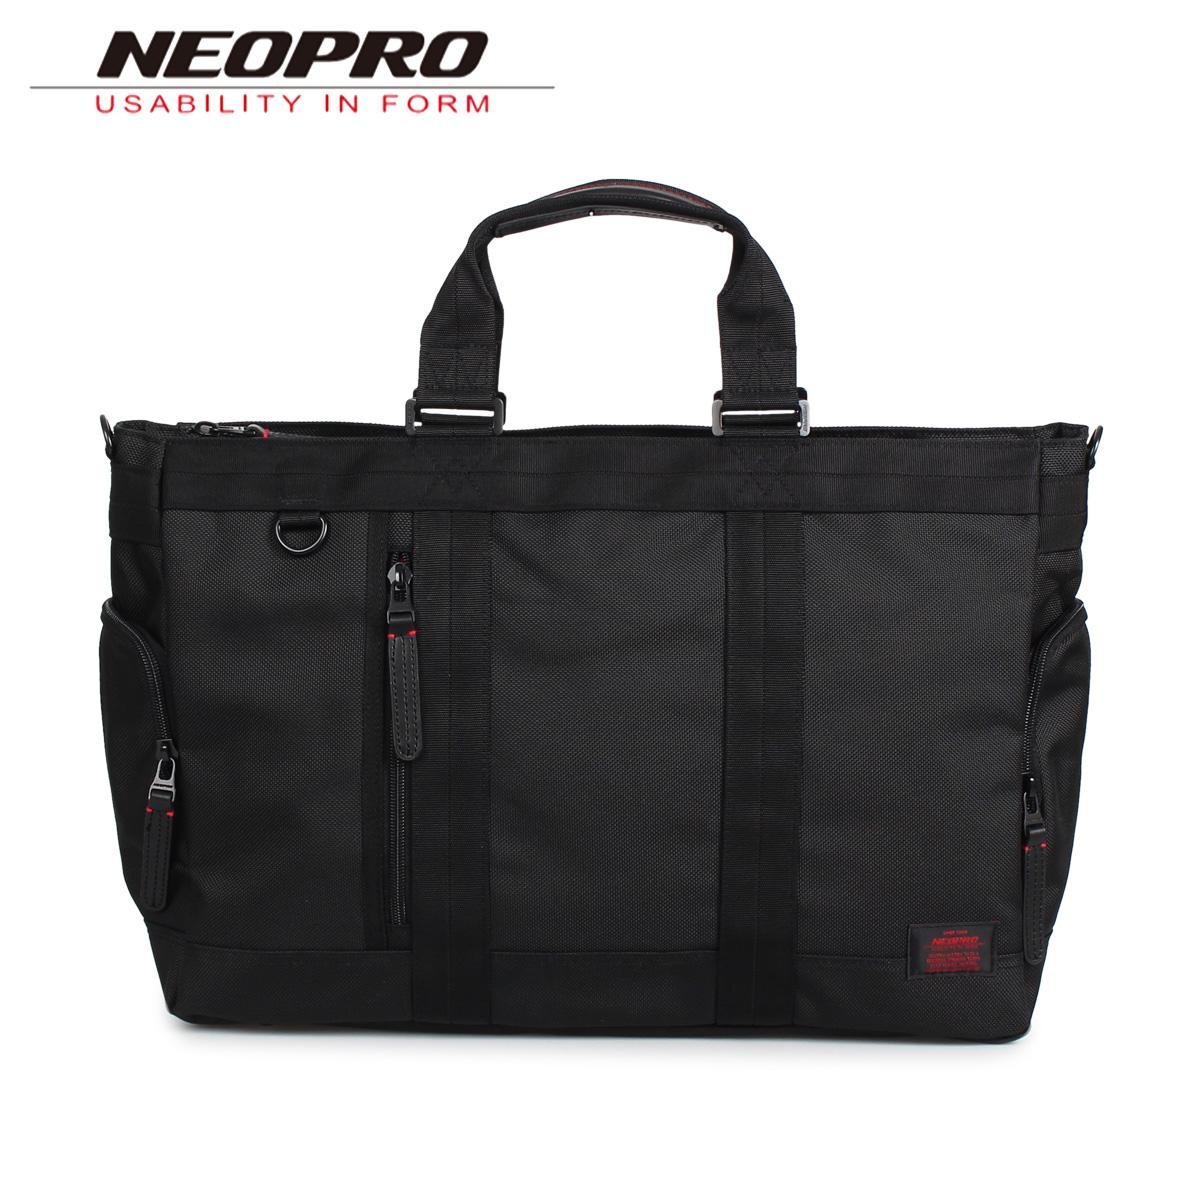 NEOPRO RED ネオプロ トートバッグ ボストンバッグ メンズ ブラック 黒 2-034